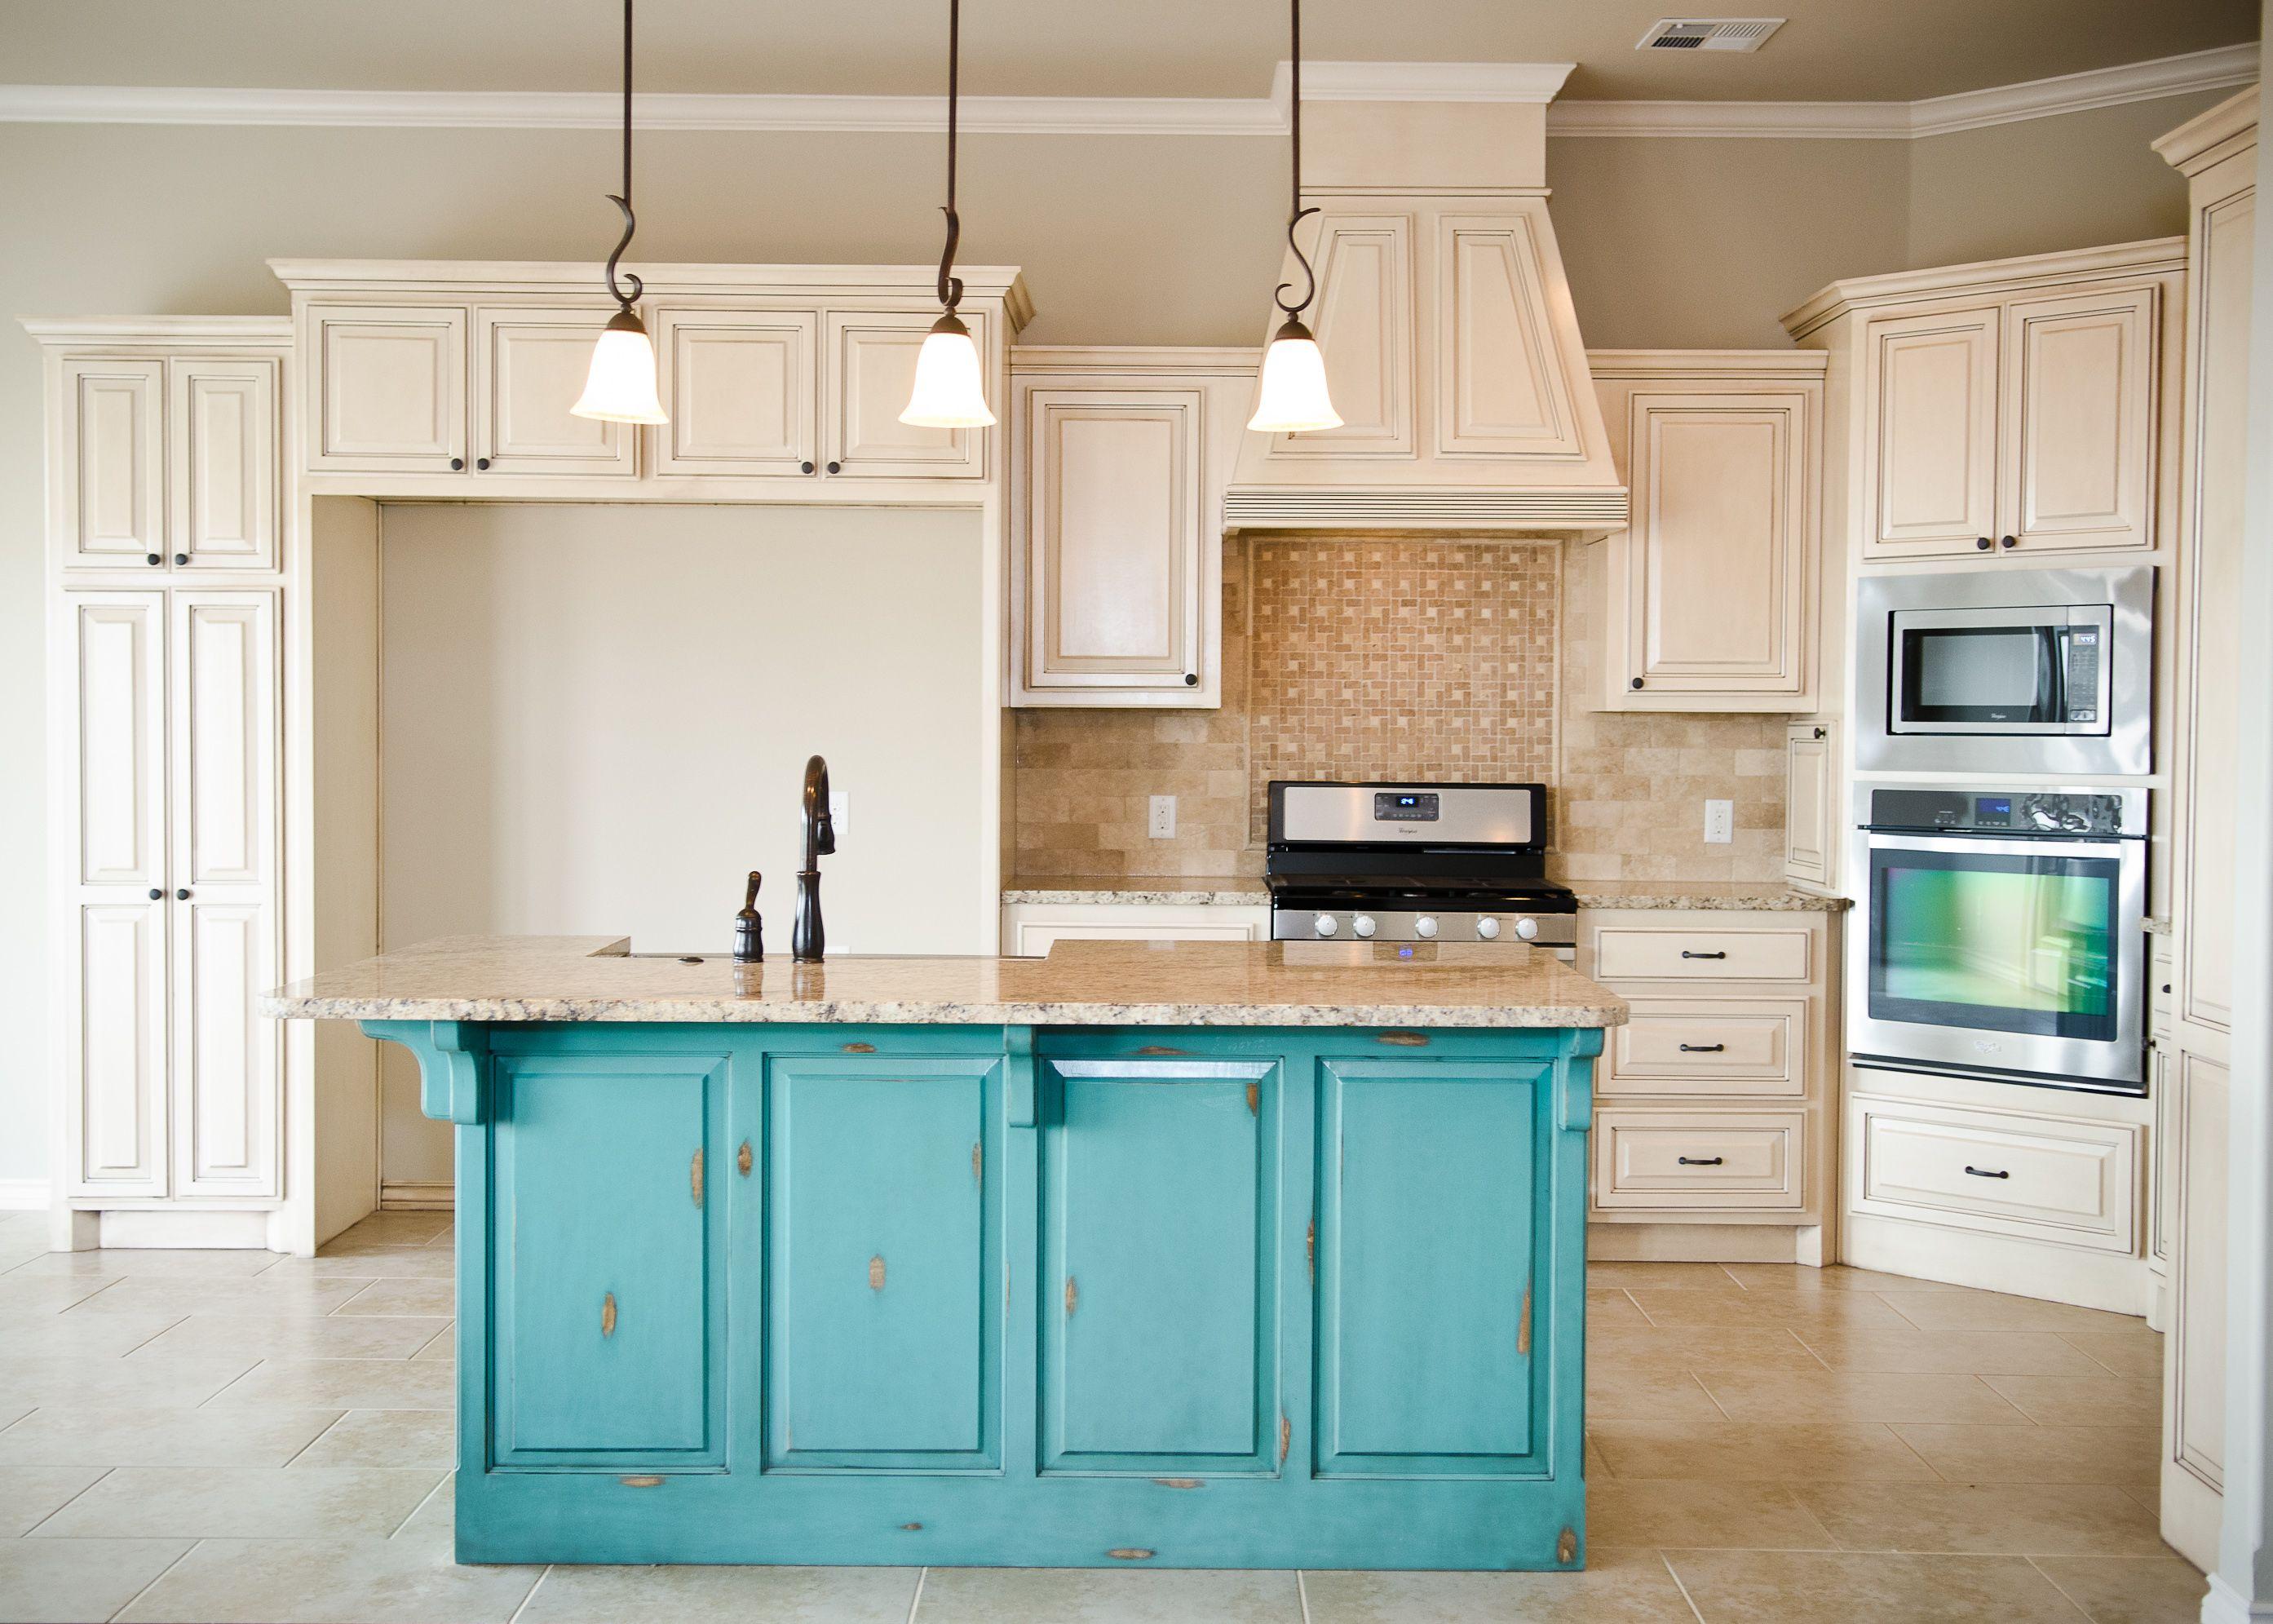 cream kitchen cabinets Distressed White Kitchen Cabinets Cream Distressed Kitchen Cabinets With Islands